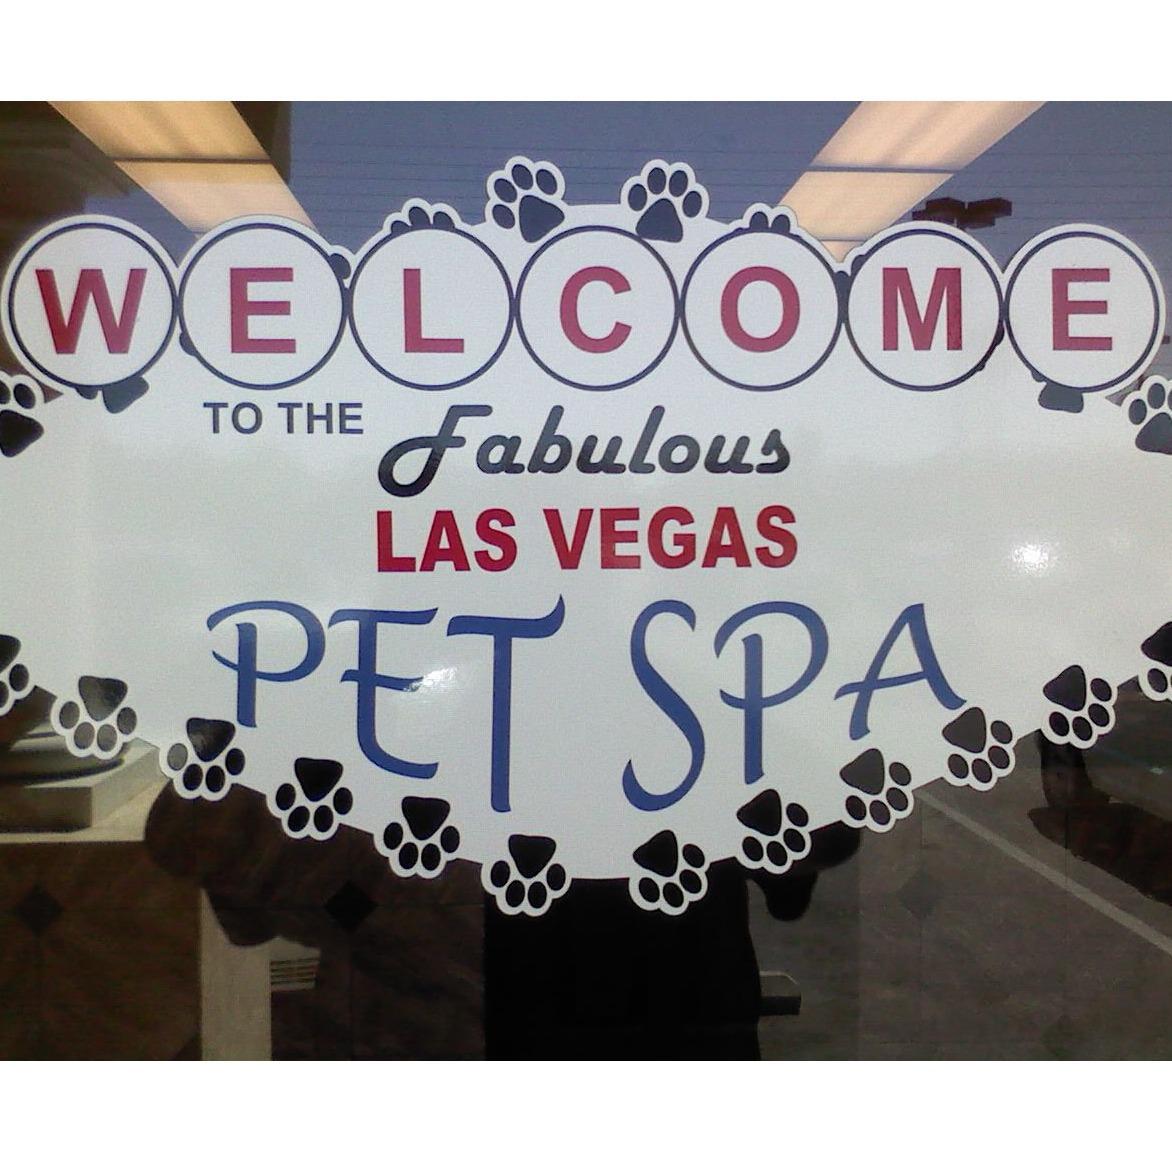 Las Vegas Pet Spa